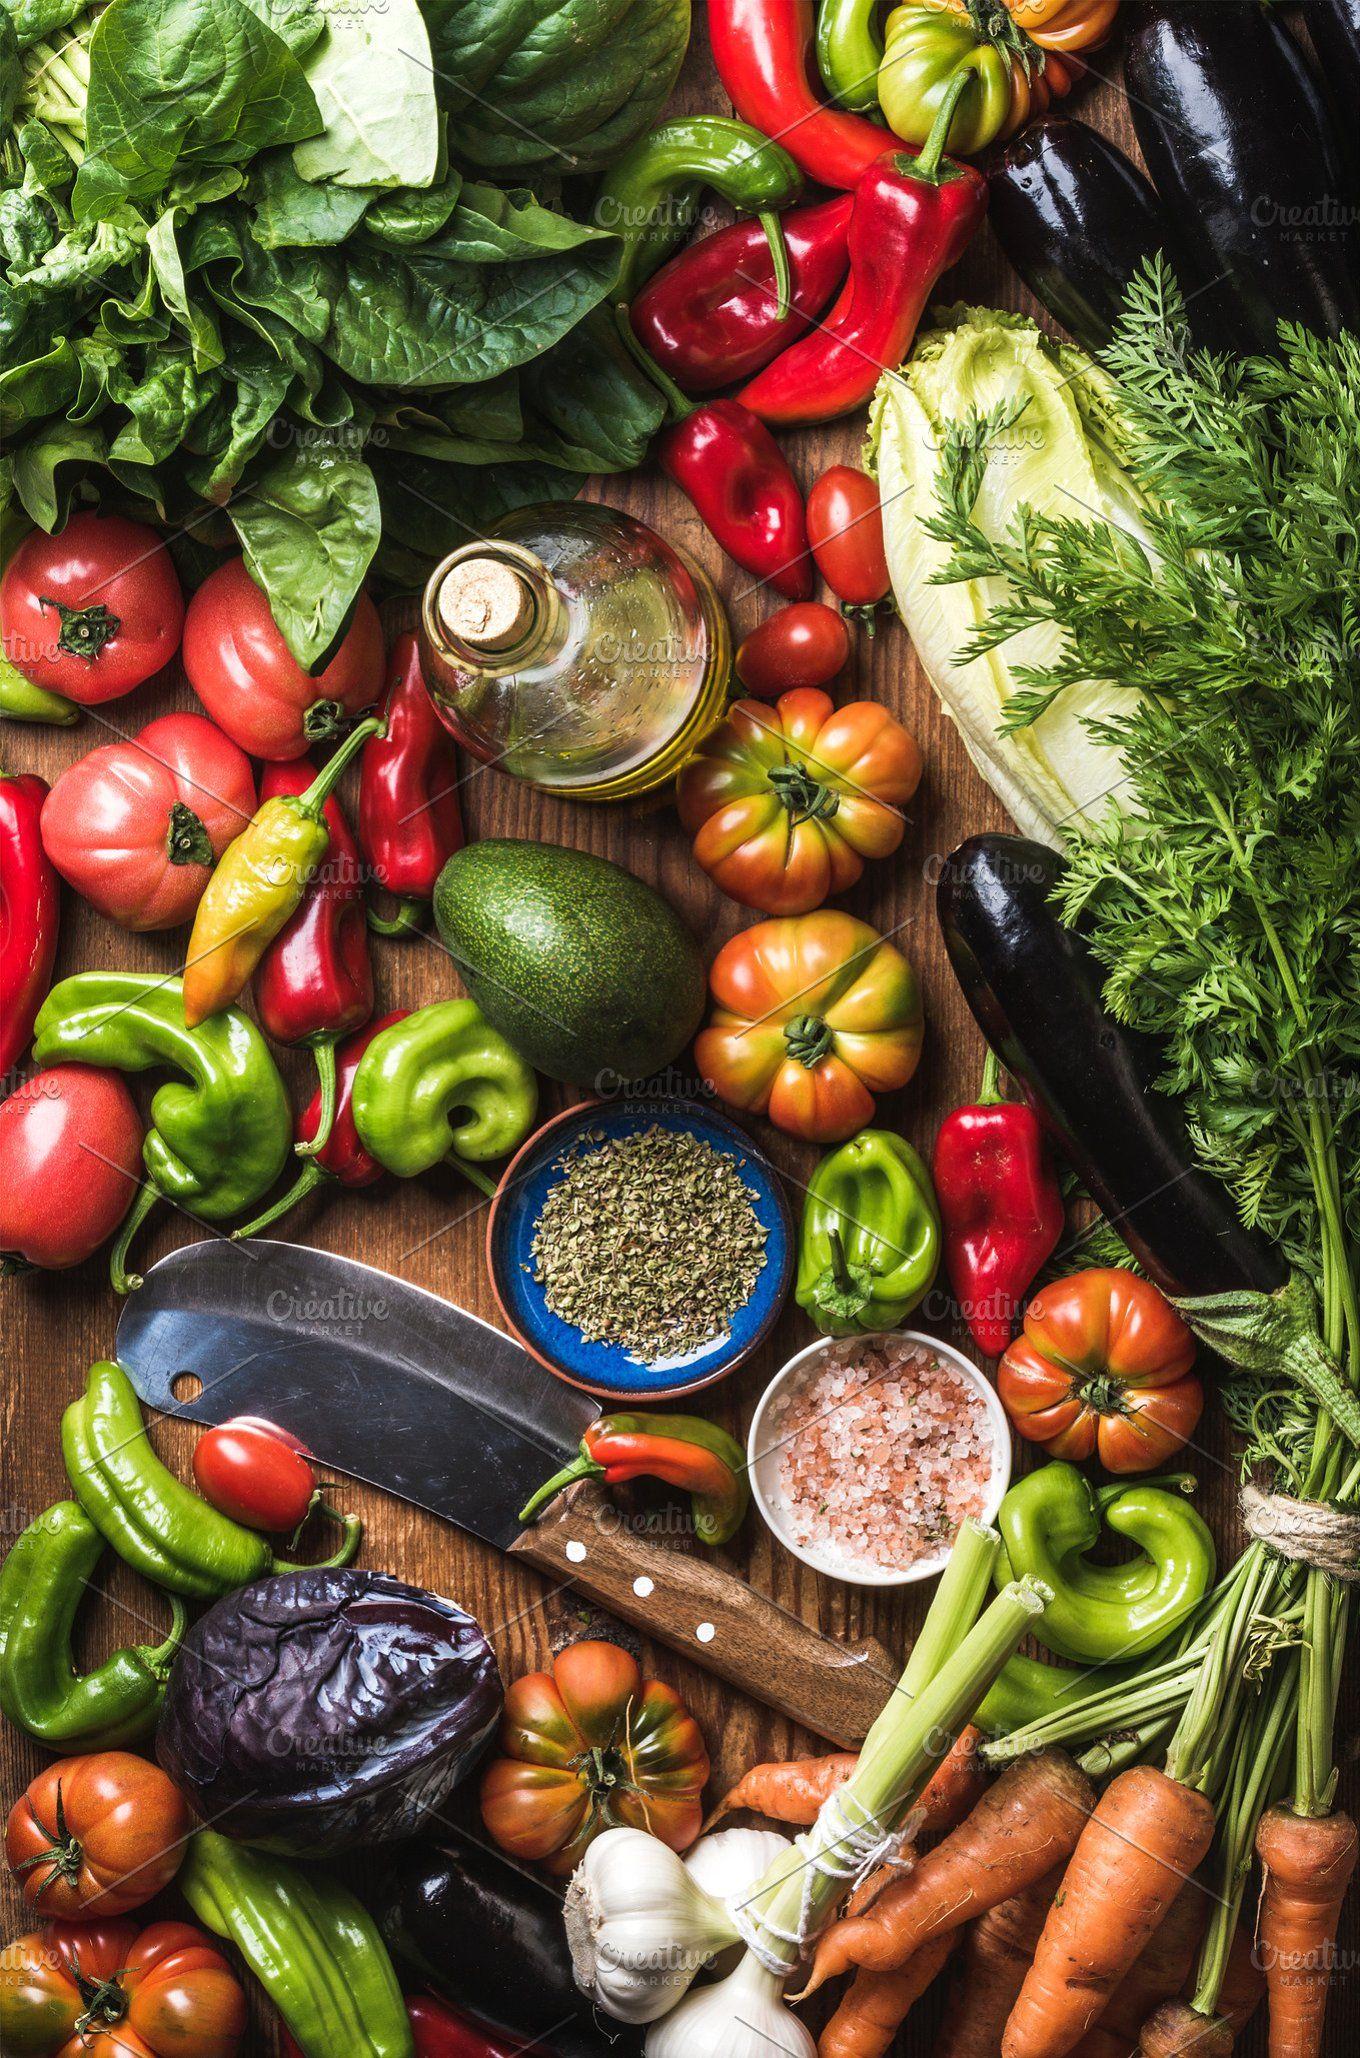 Dinner cooking ingredints in 2020 | Raw vegetables, Fruits ...